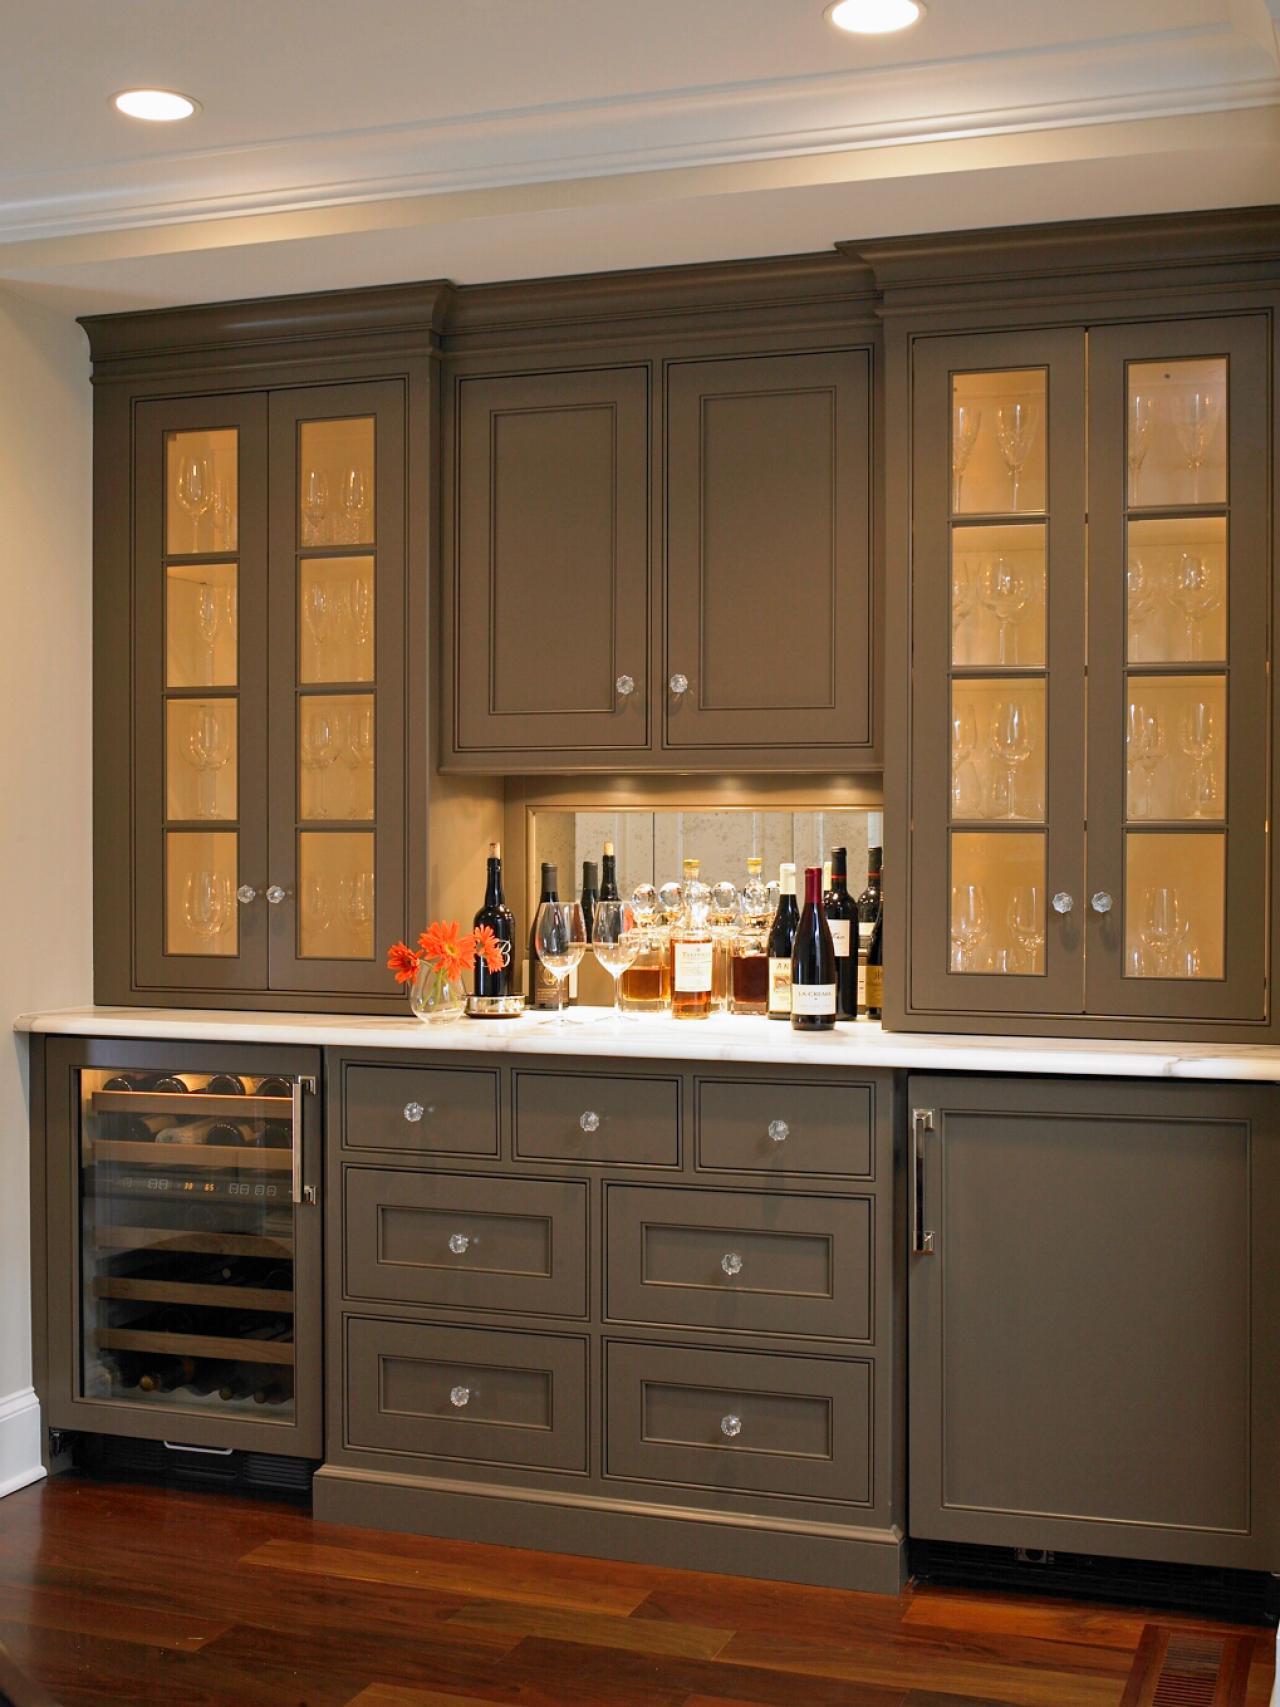 kitchen cabinets ideas colors photo - 1